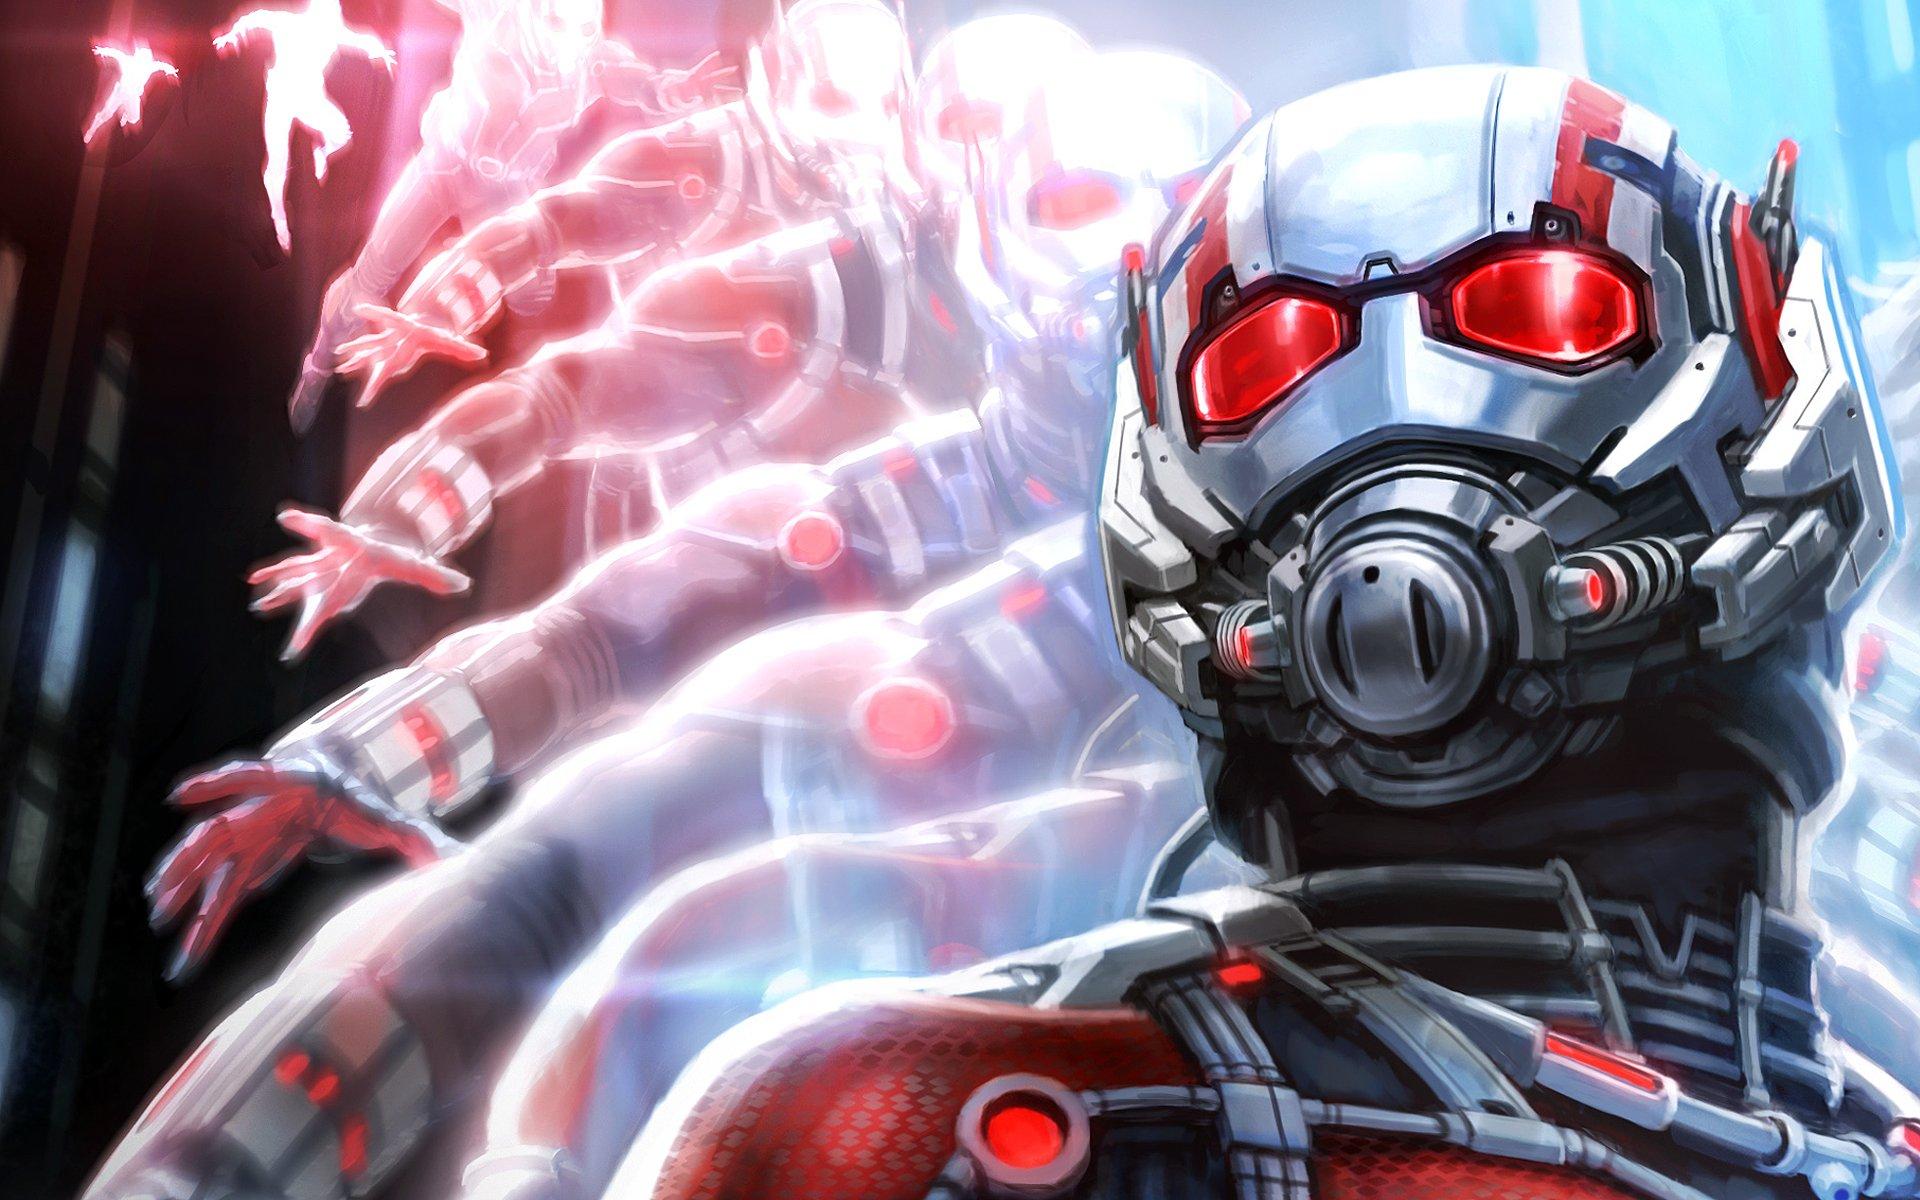 Ant Man Retina Movie Wallpaper: ANT-MAN Comics Movie Comic Superhero Marvel Action Ant Man